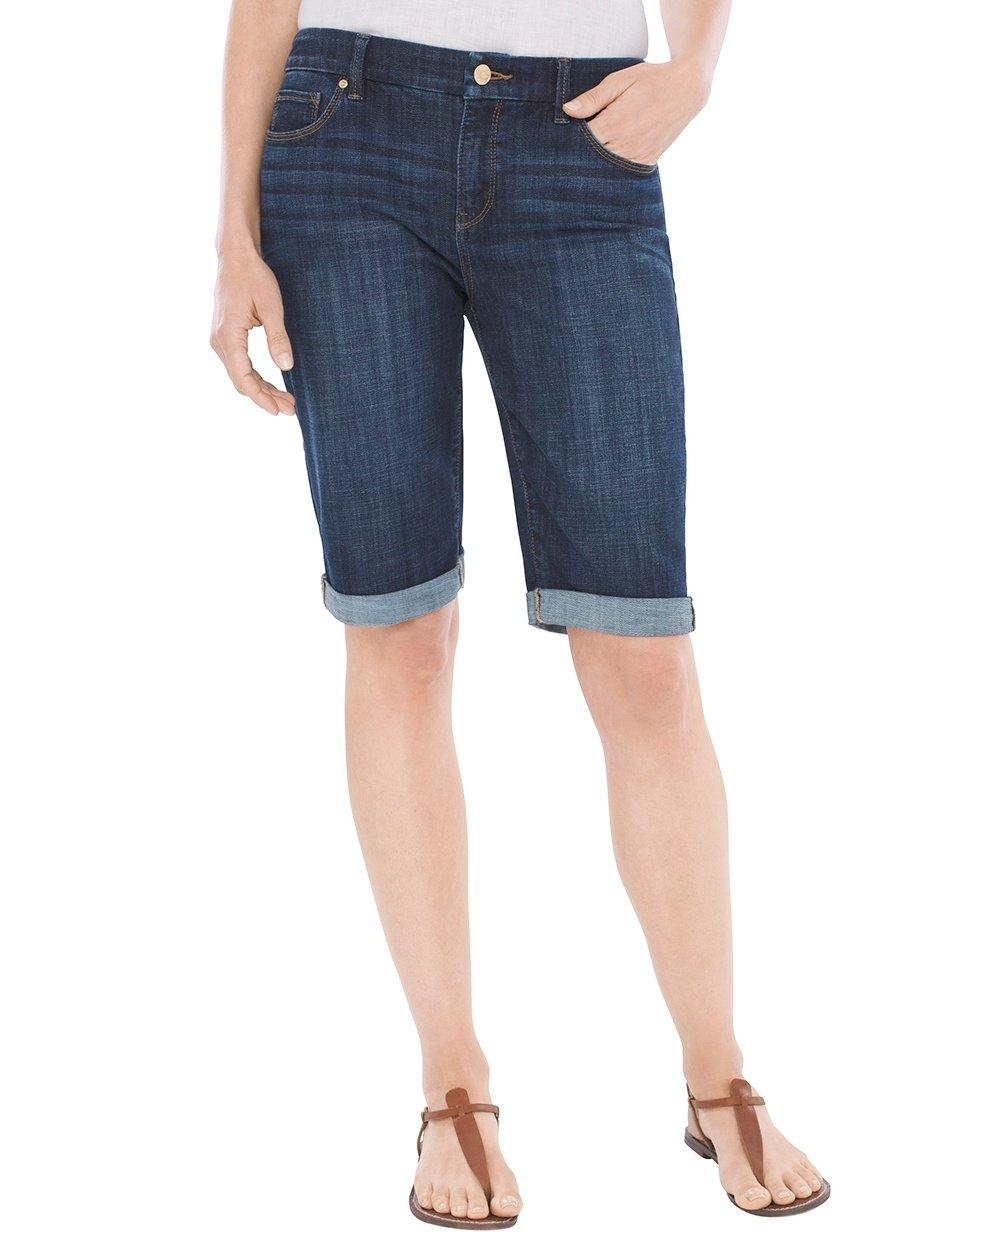 Chico's Women's So Slimming Girlfriend Shorts- 12 inch Inseam Size 12 L (2) Indigo